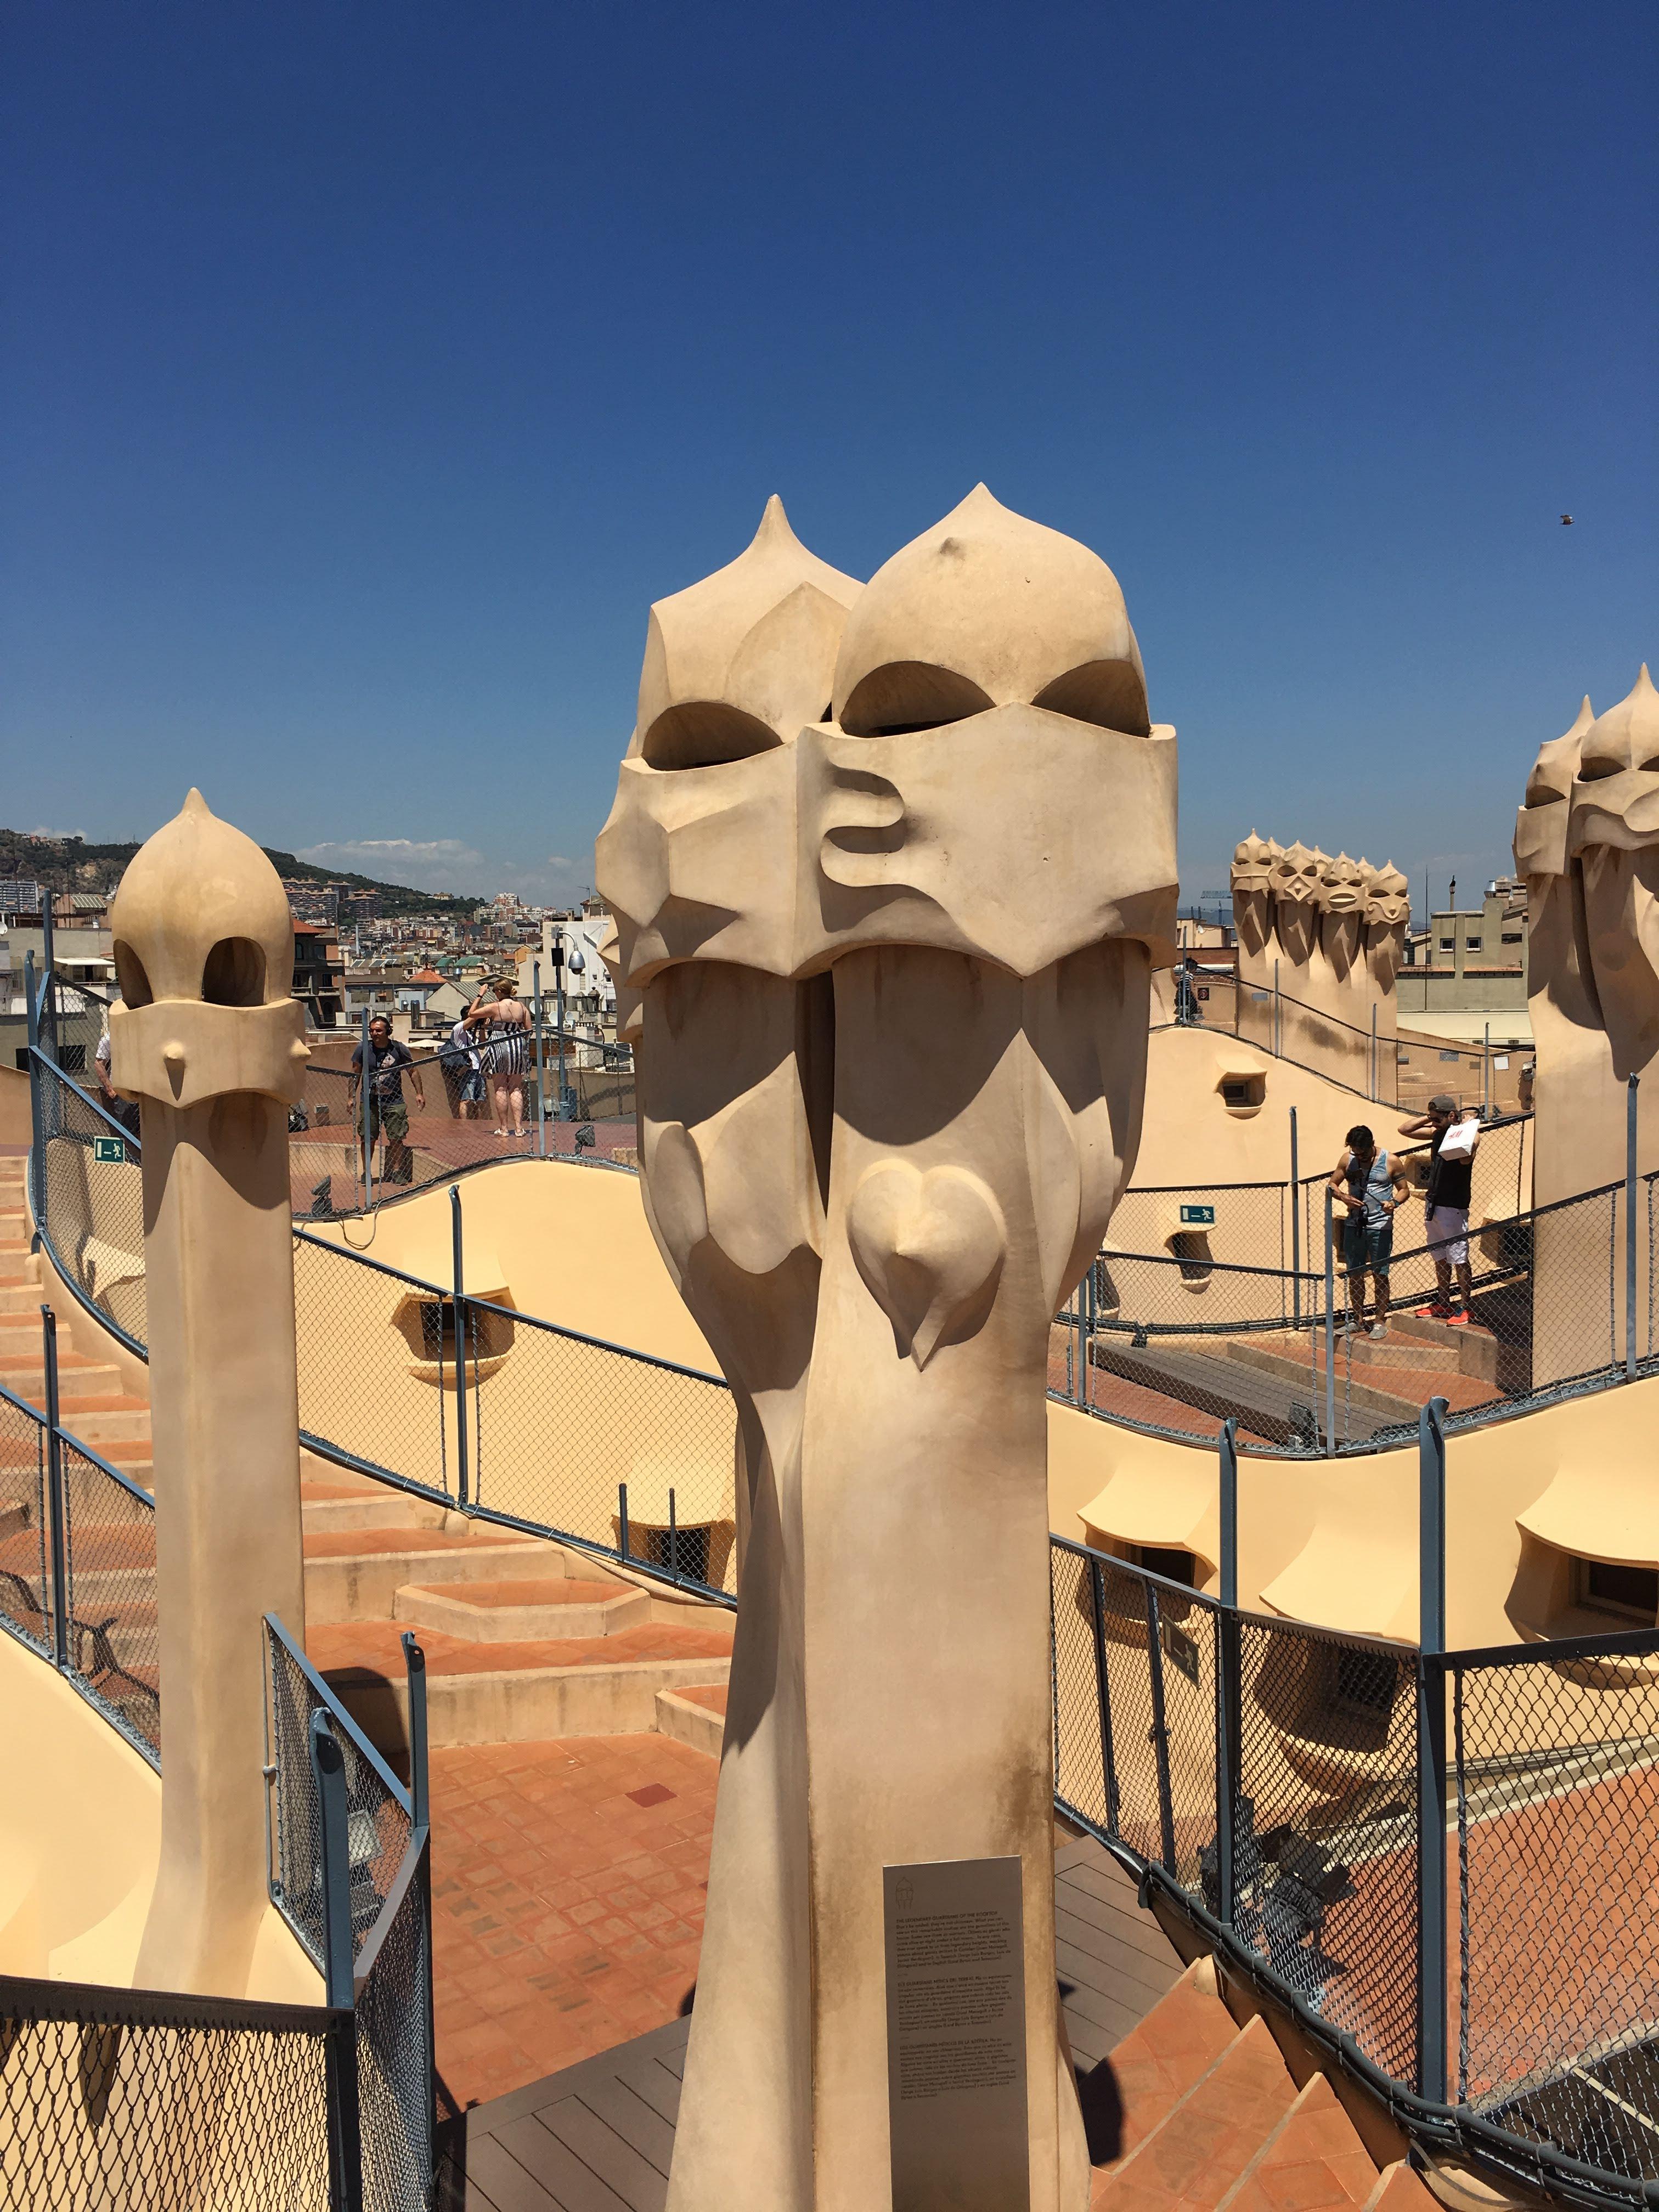 Guardians on the Roof Terrace of La Padrera, aka Casa Milá, by Antoni Gaudí, Barcelona, Spain, June 2018